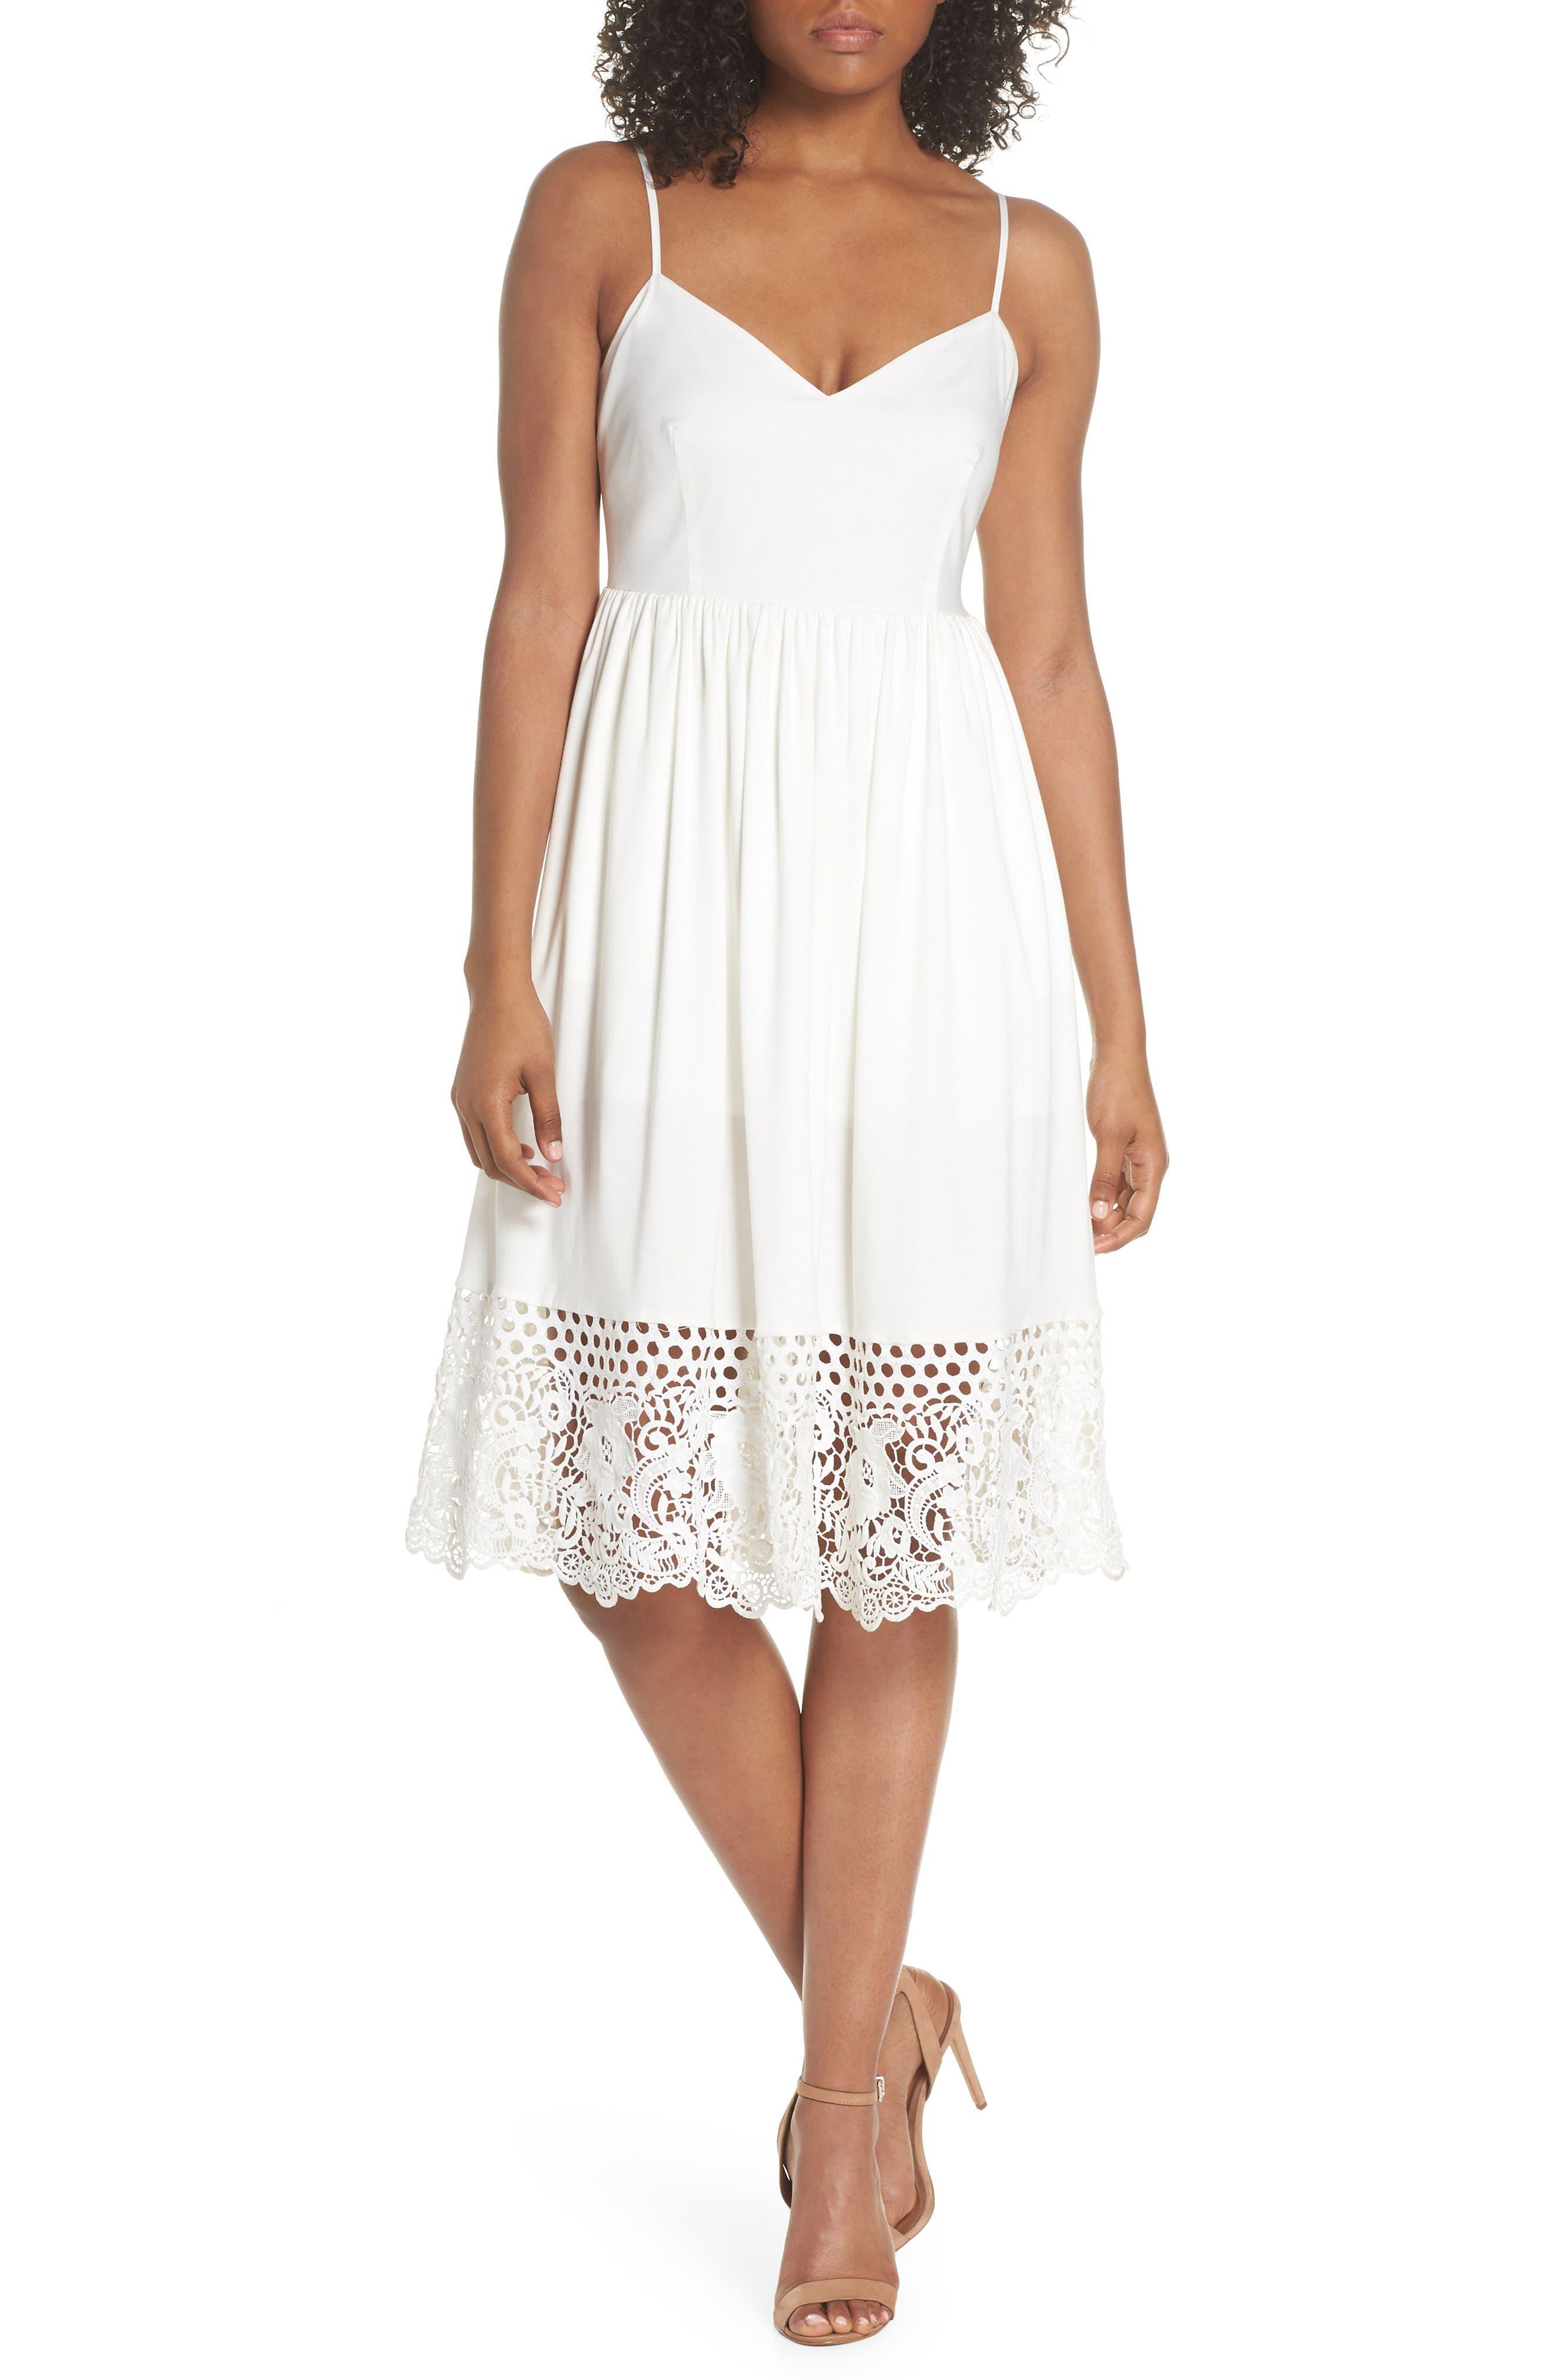 Salerno Lace Trim Jersey Dress,                             Main thumbnail 1, color,                             106